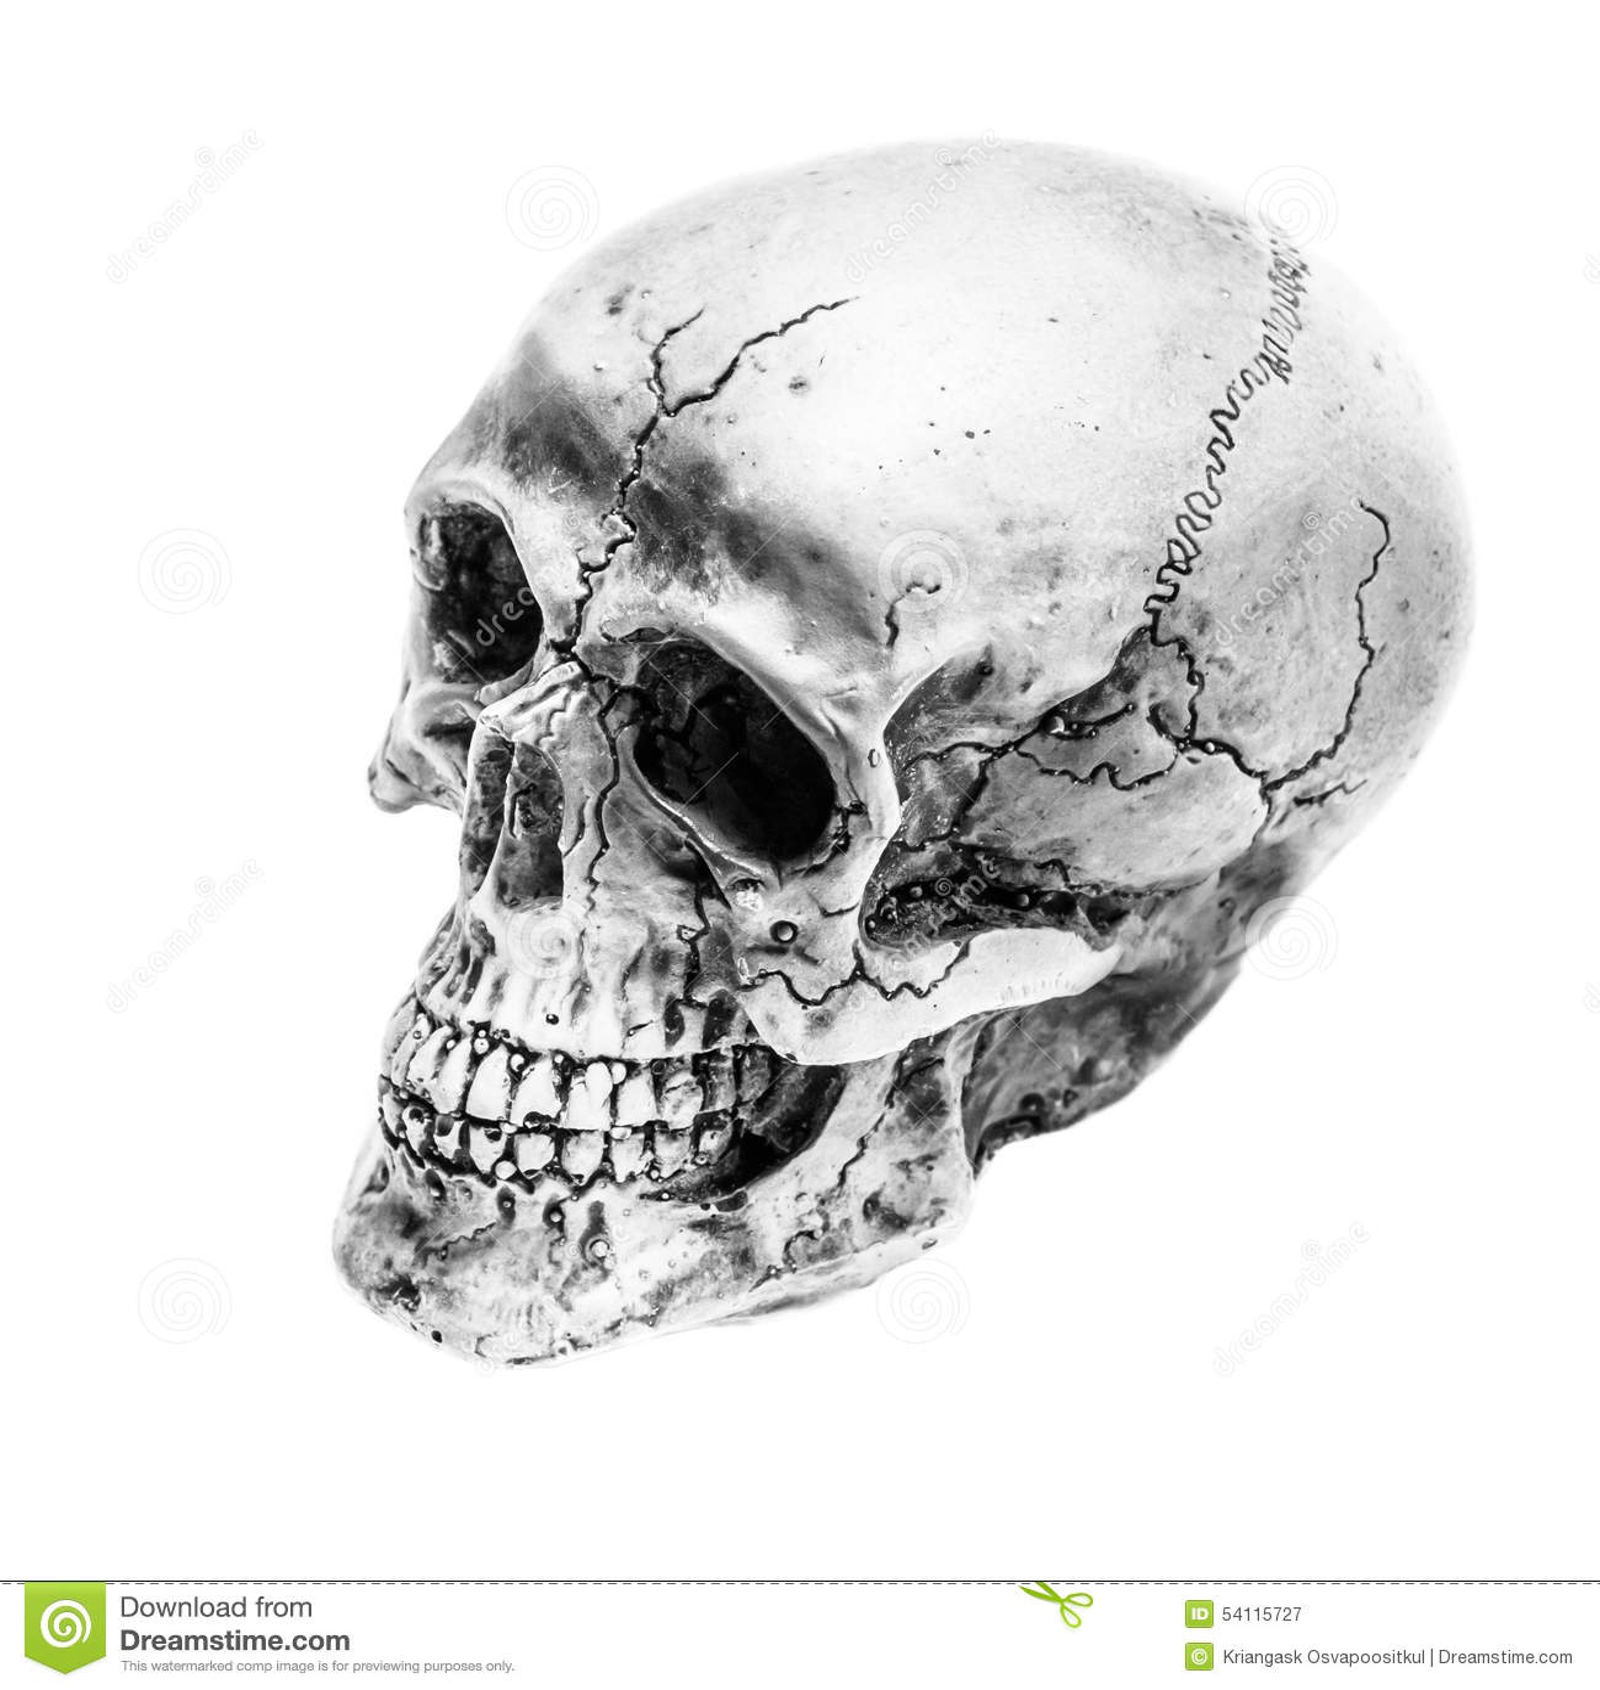 Still Lifeblack And White Of Human Skull On White Background A